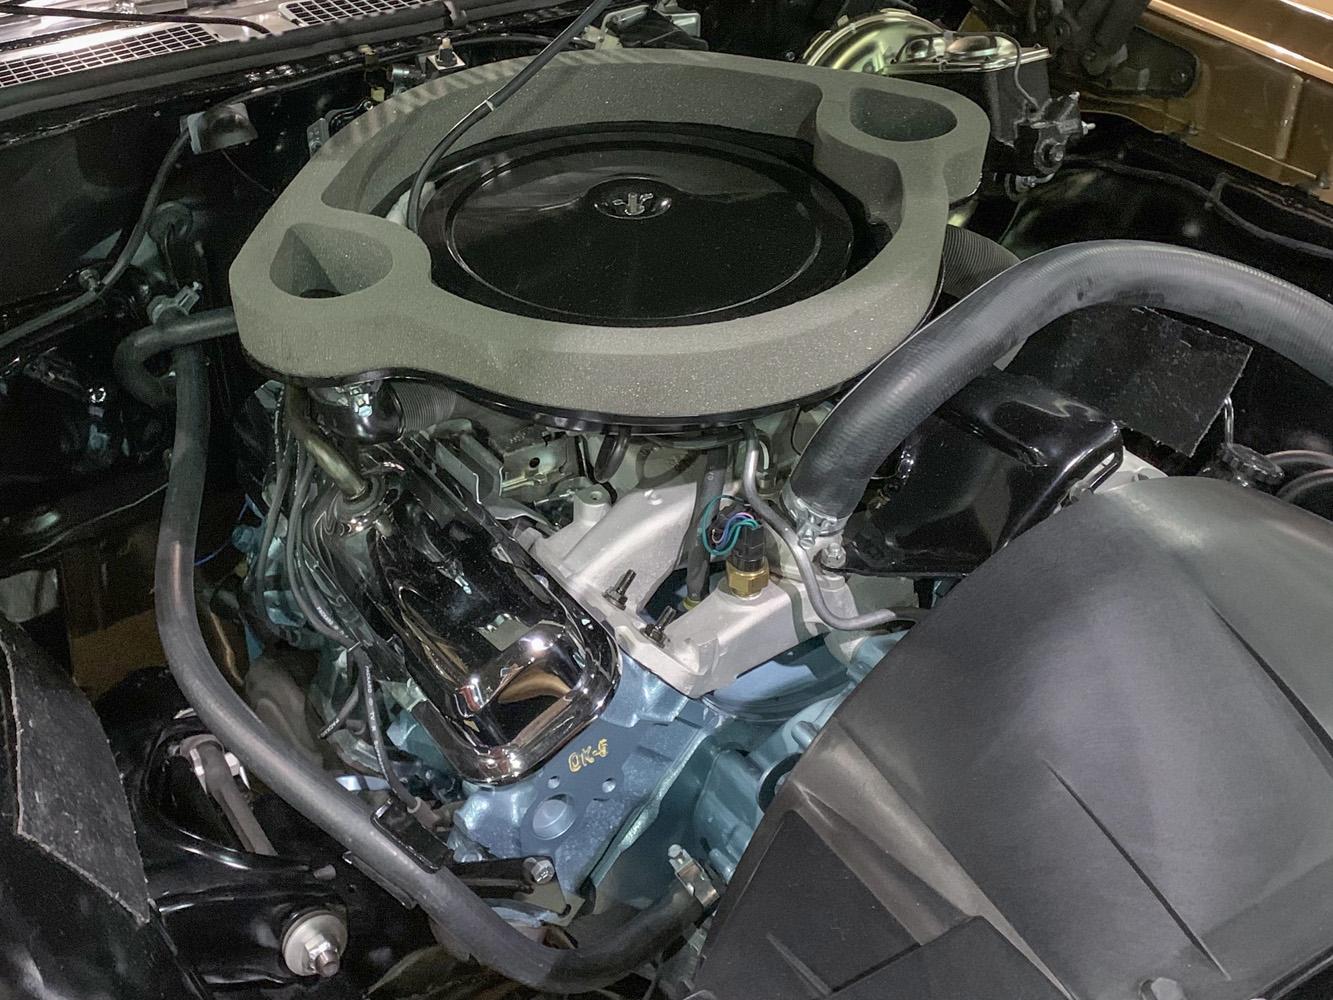 1970 Pontiac Ram Air IV GTO engine